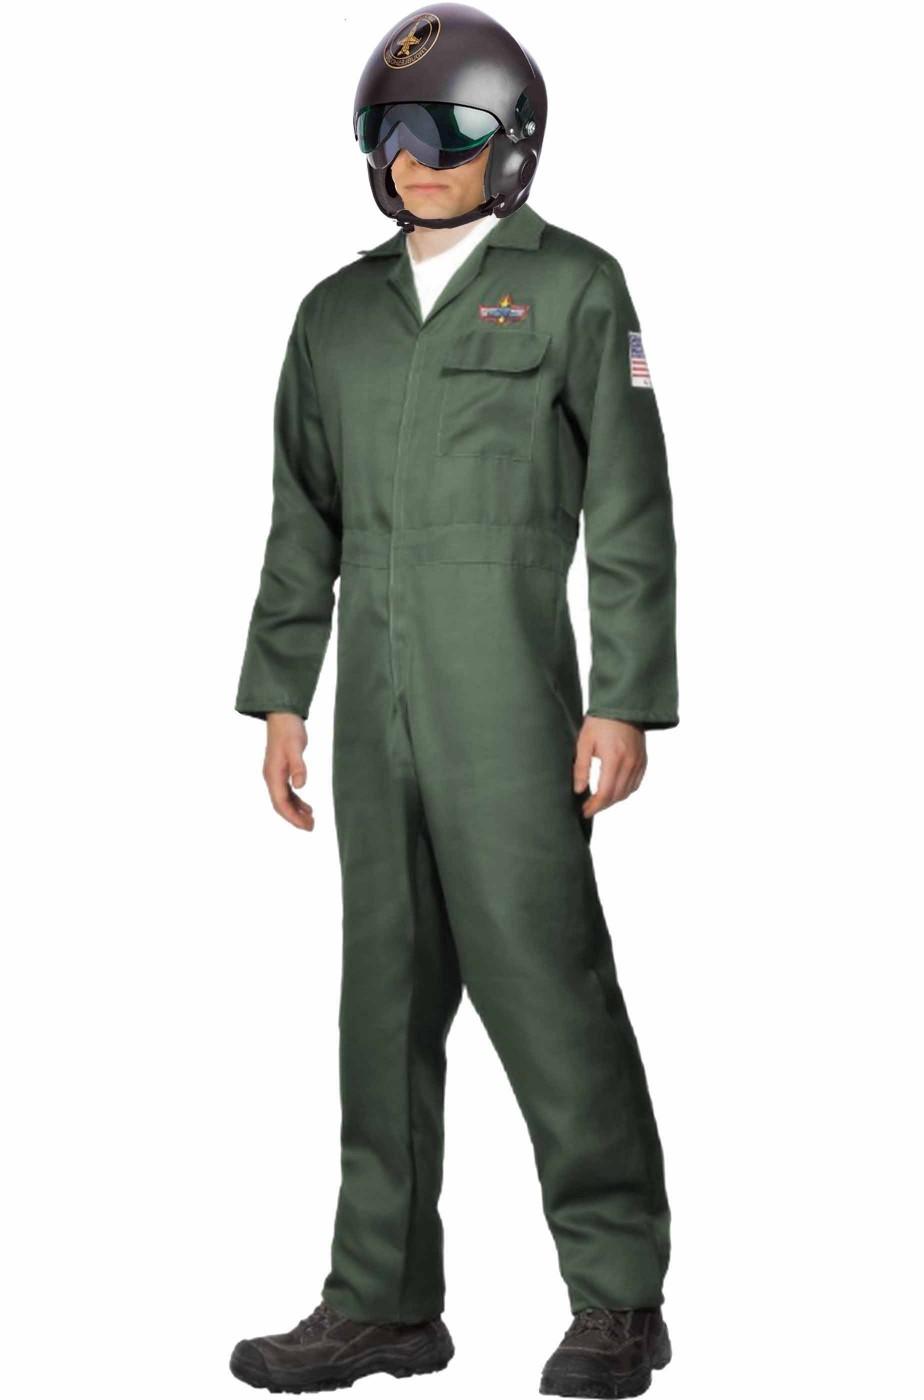 Costume top gun the maverick pilota da caccia con casco